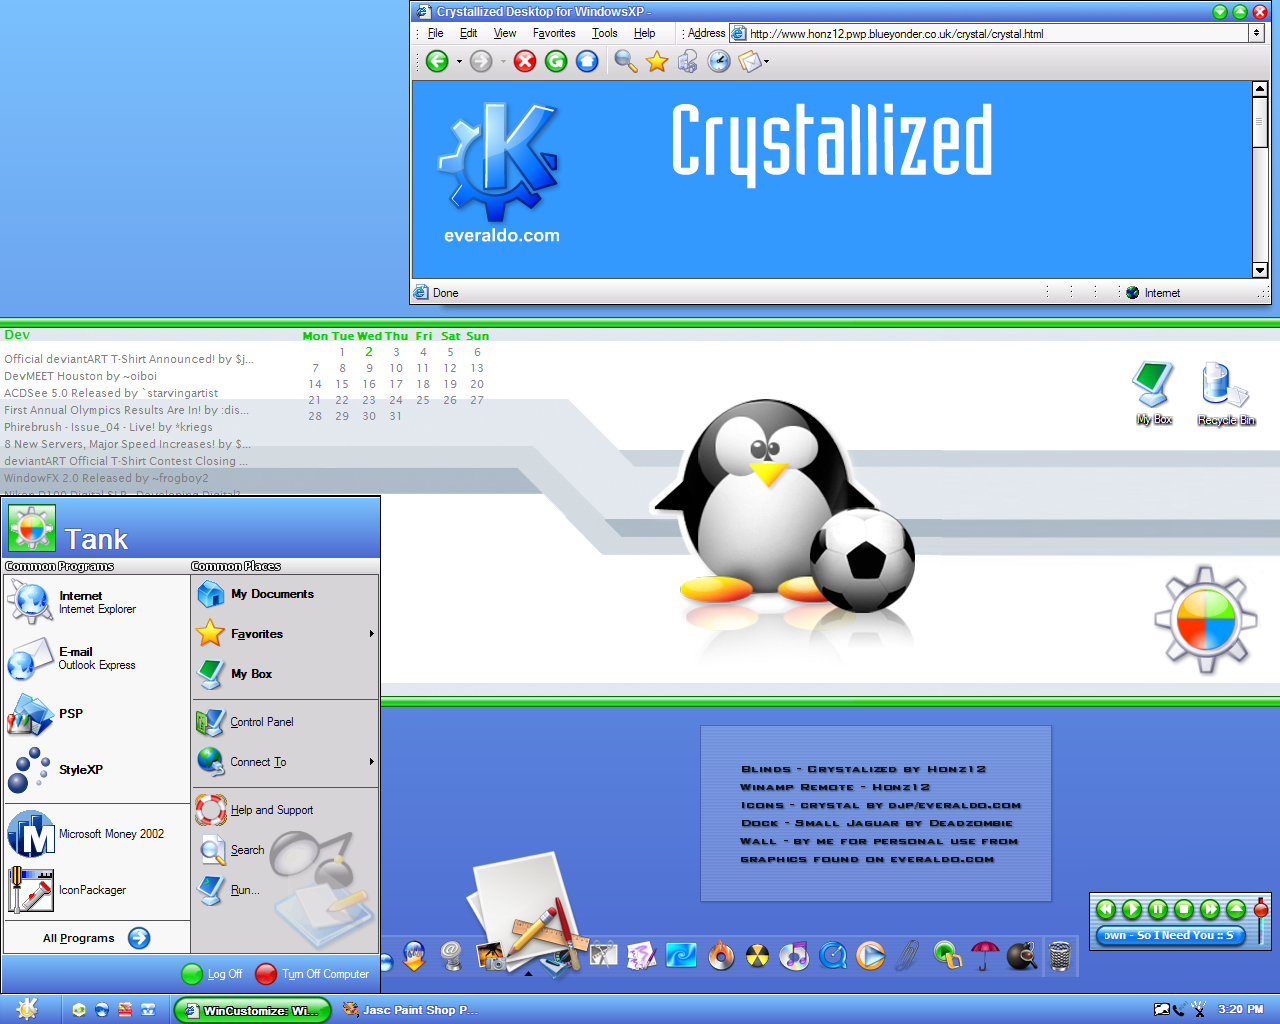 Crystalized XP by titanpsp